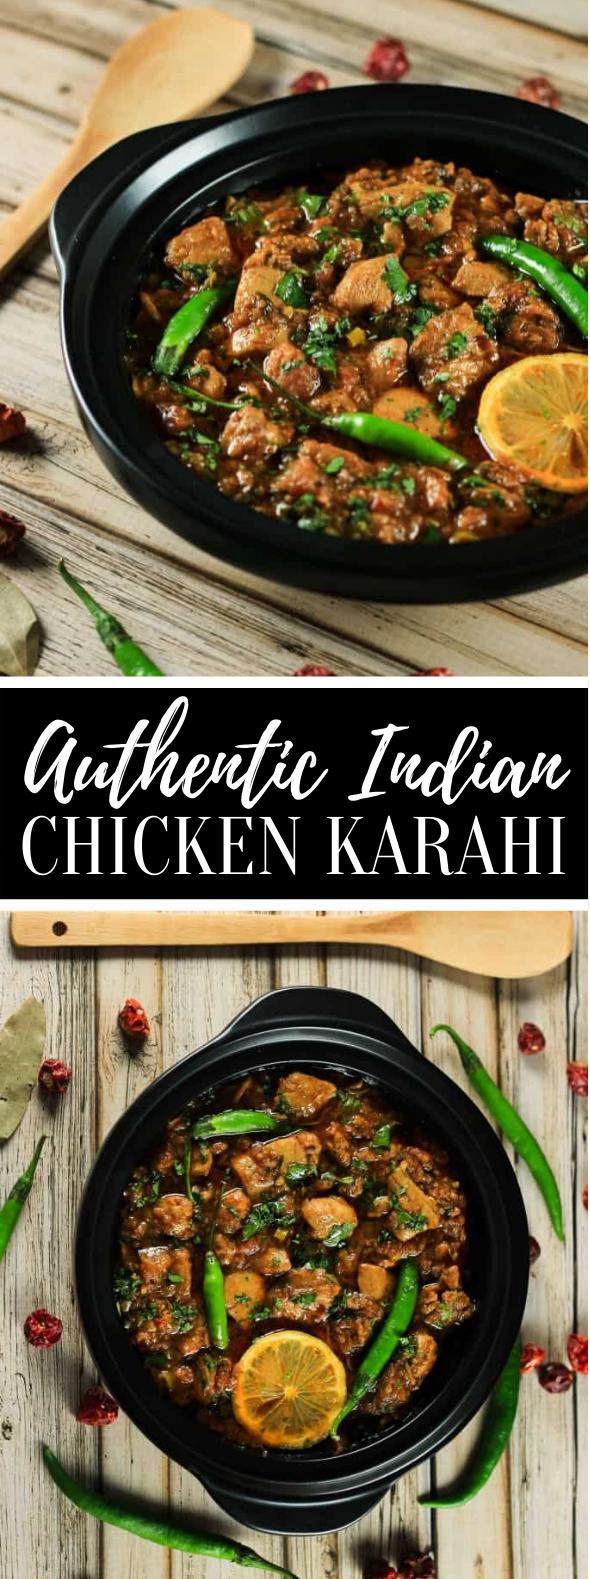 AUTHENTIC CHICKEN KARAHI CURRY #dinner #familyrecipes